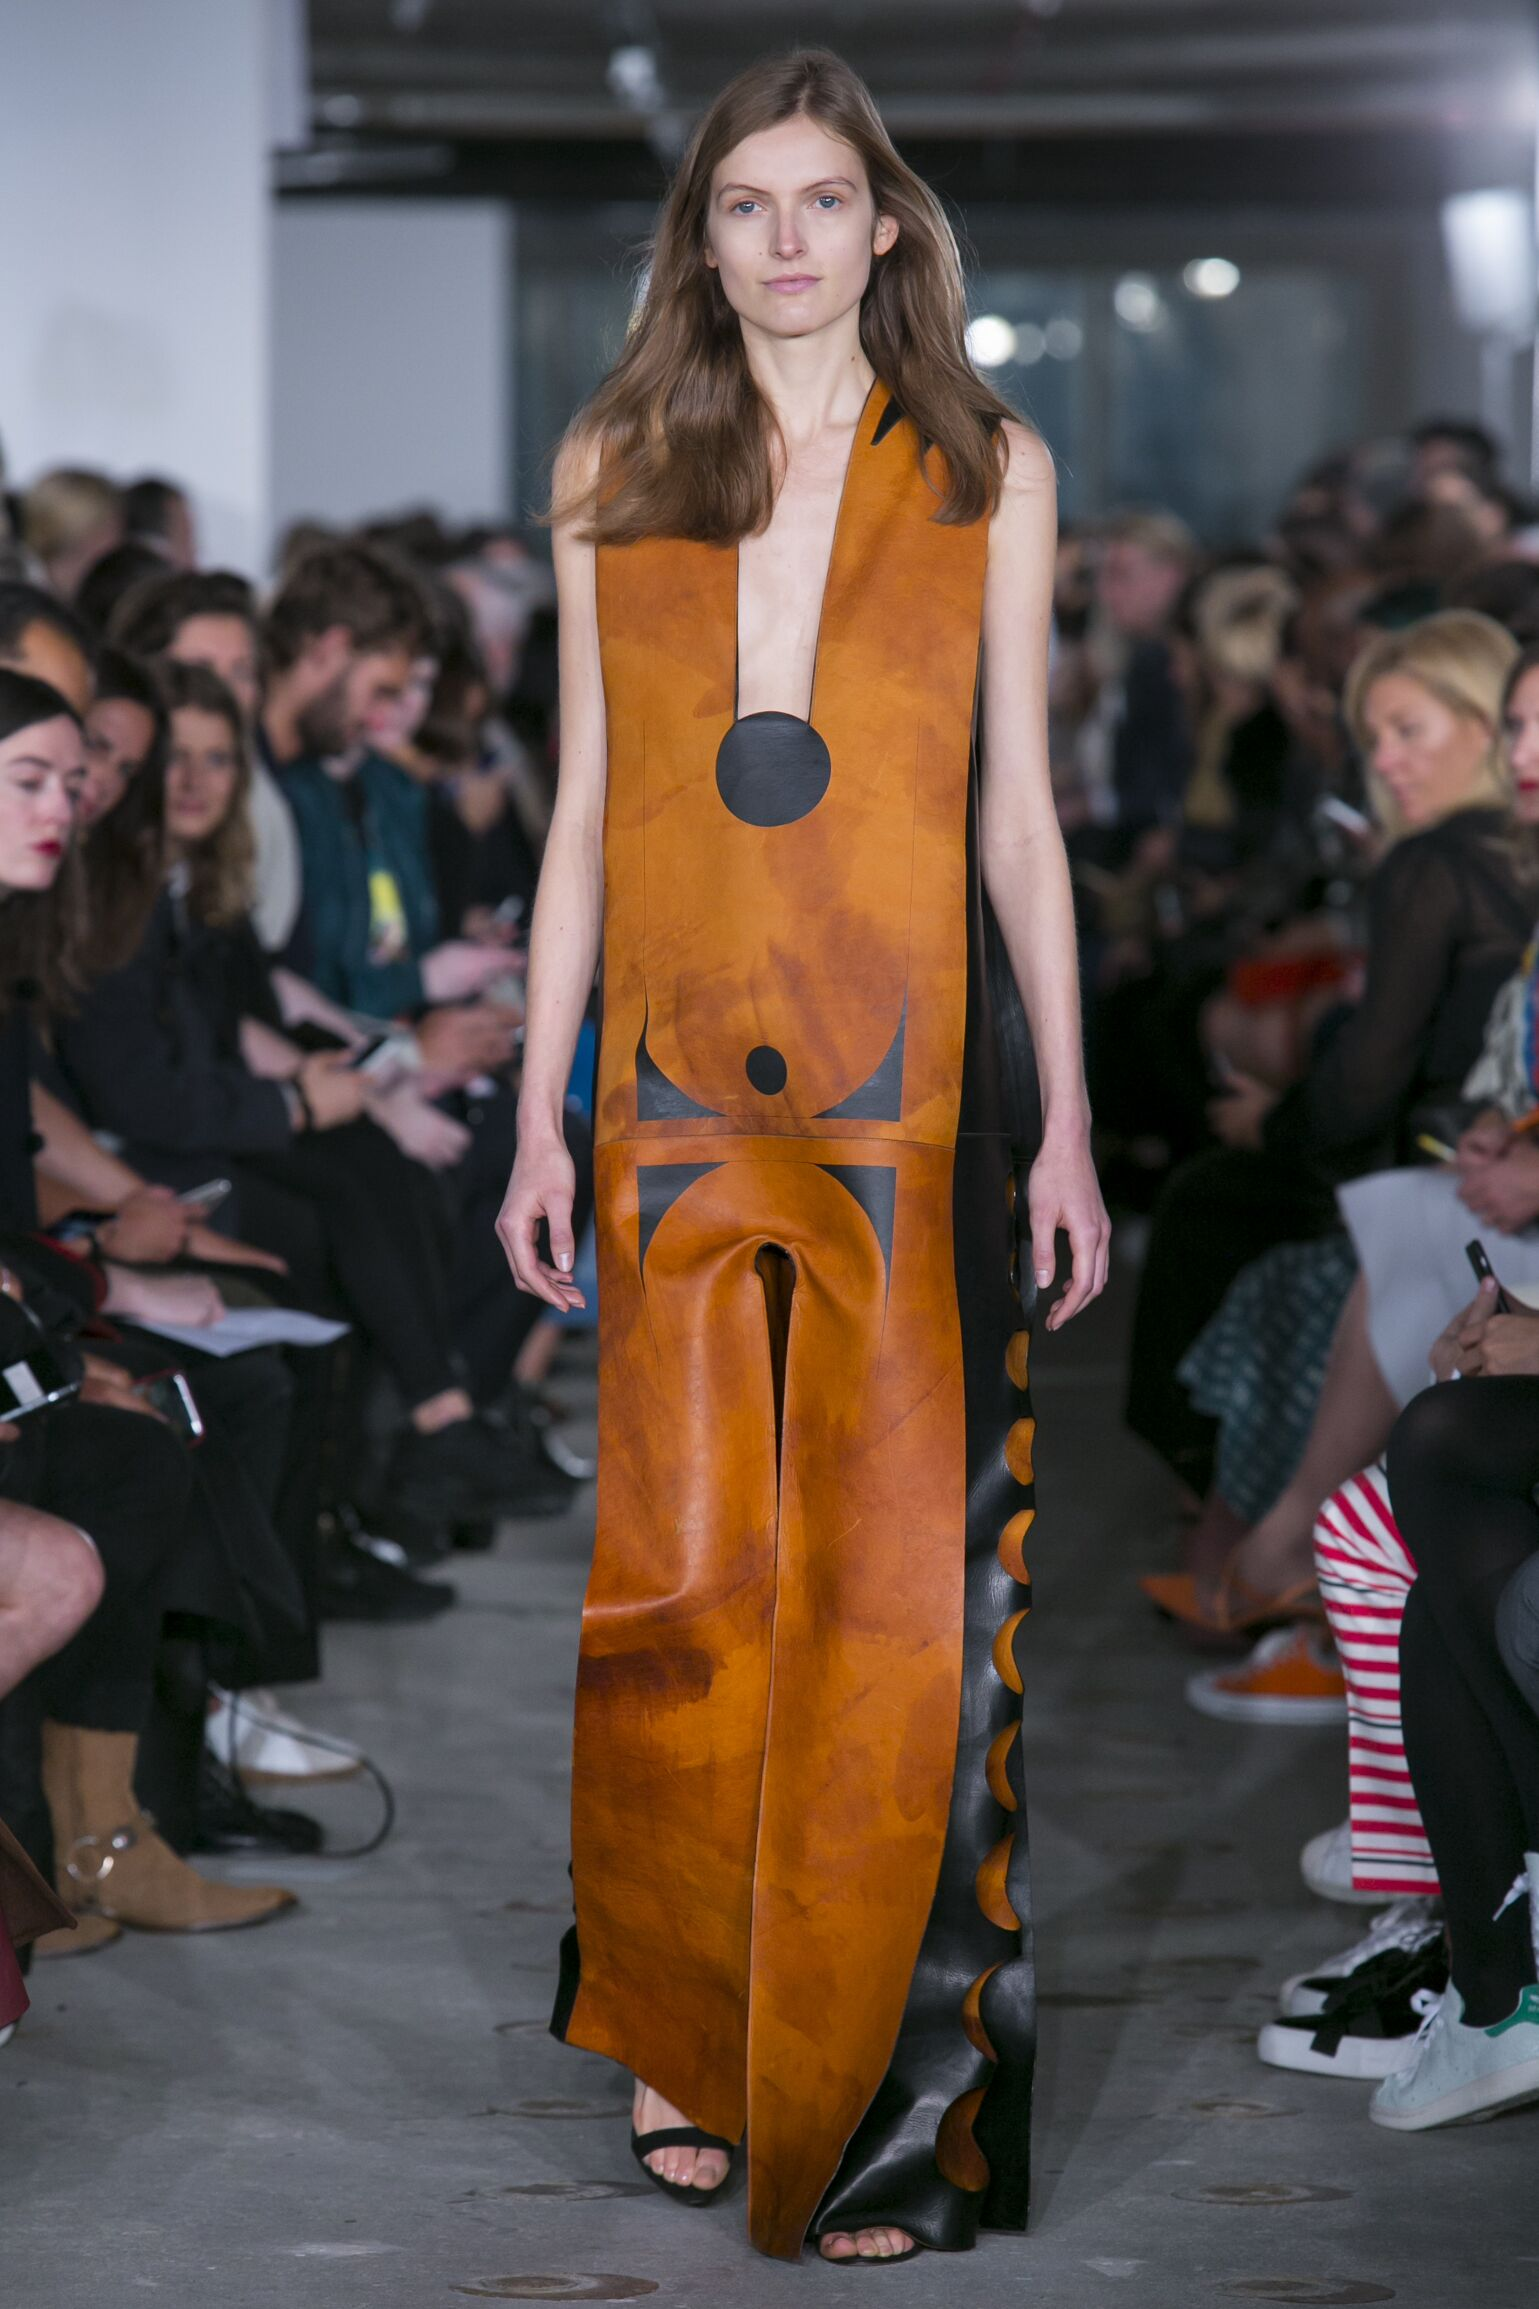 2016 Fashion Woman Model Thomas Tait Collection Catwalk